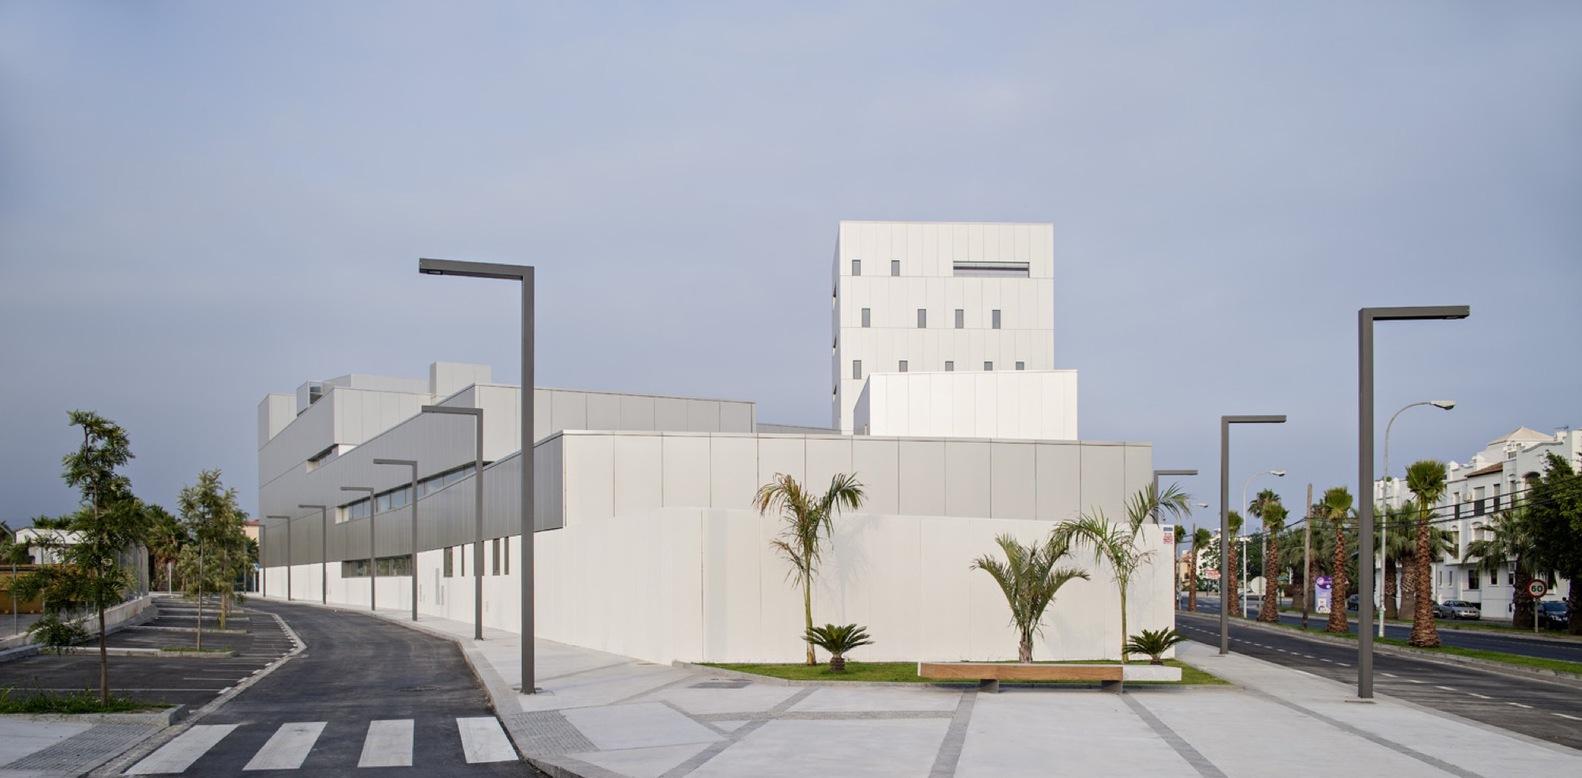 Edificio Congresos Motril